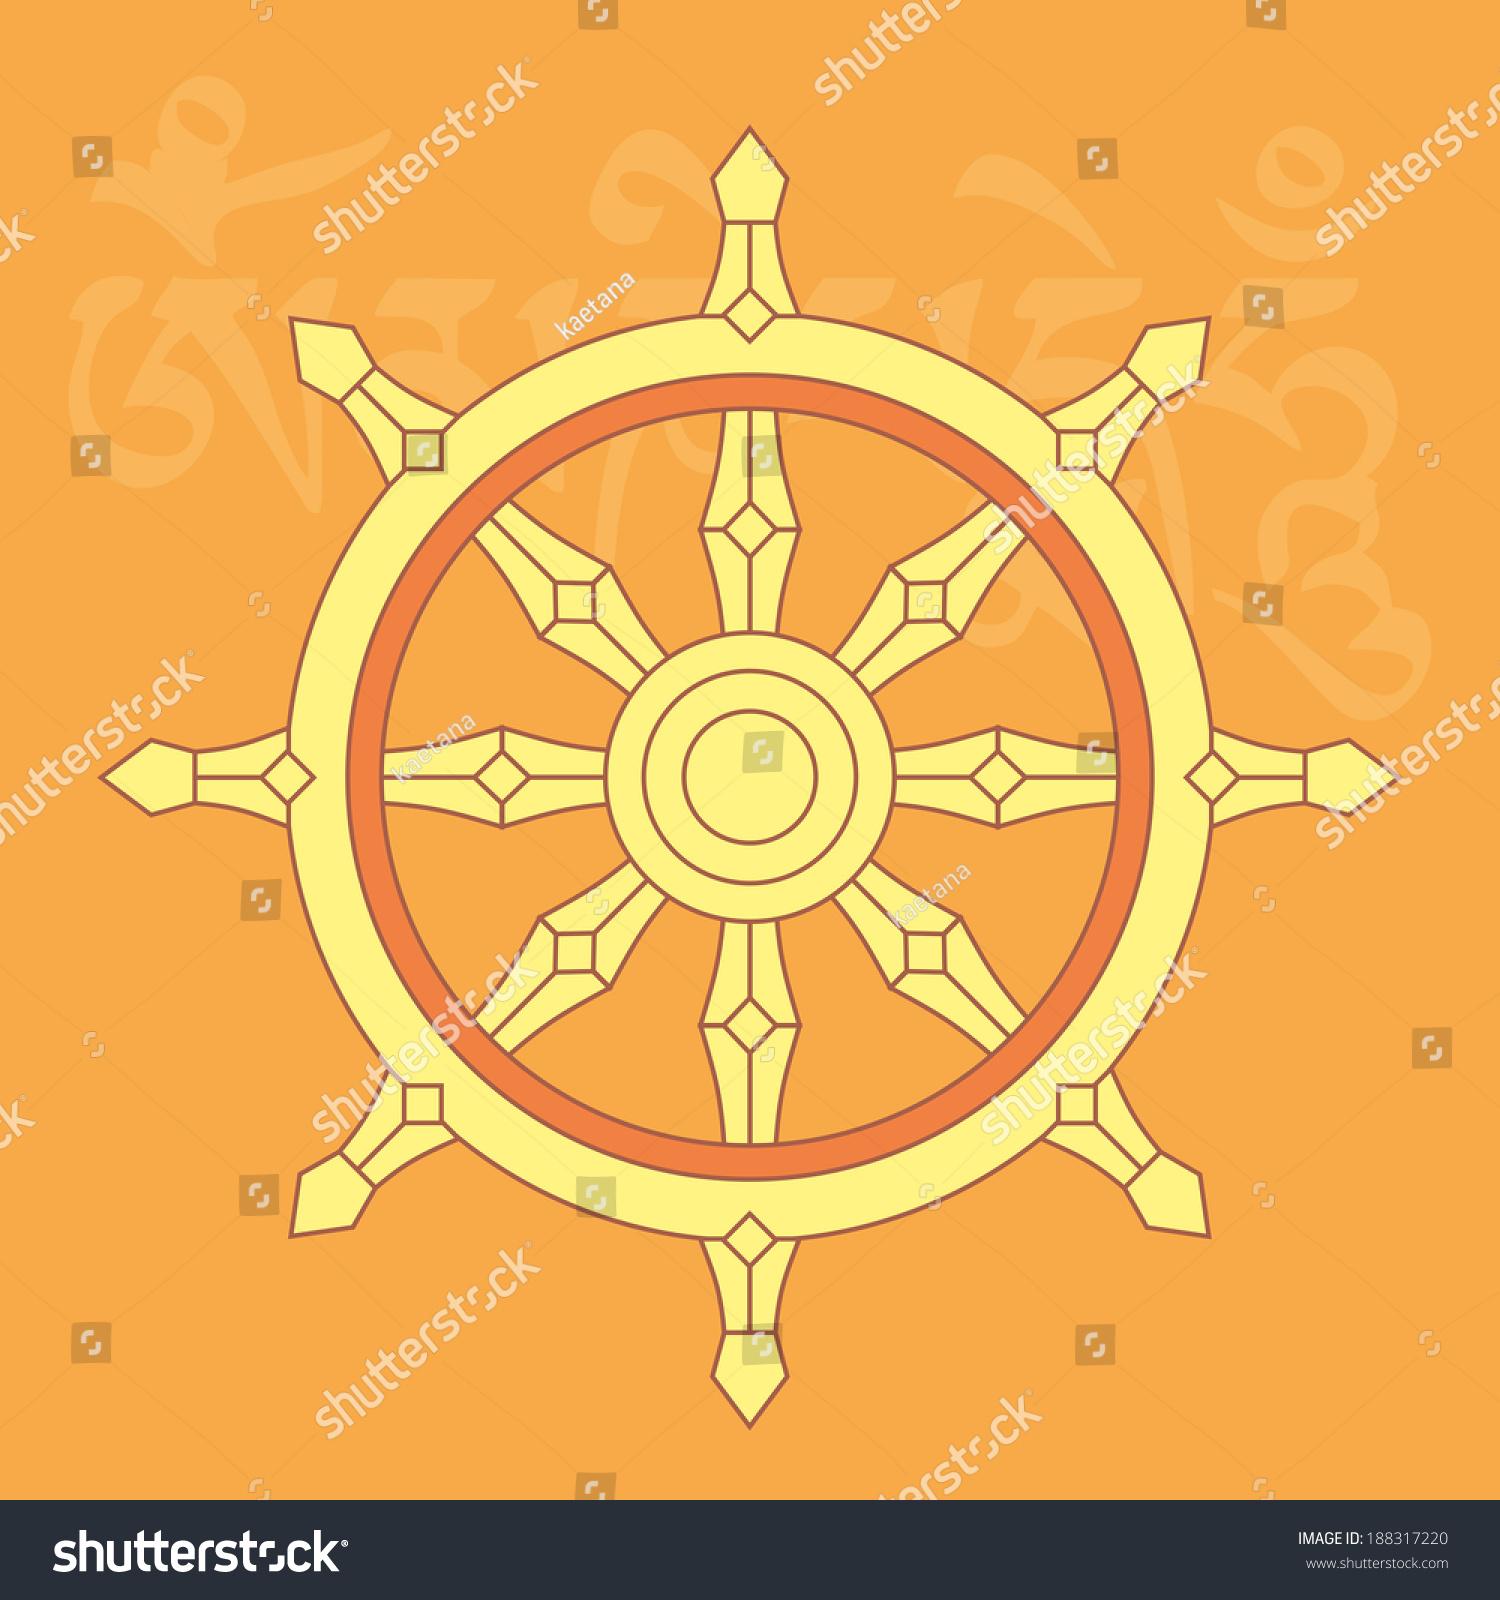 Wheel dharmaone eight auspicious buddhist religious stock vector wheel of dharmaone of eight auspicious buddhist religious symbols with mantra om mani padme buycottarizona